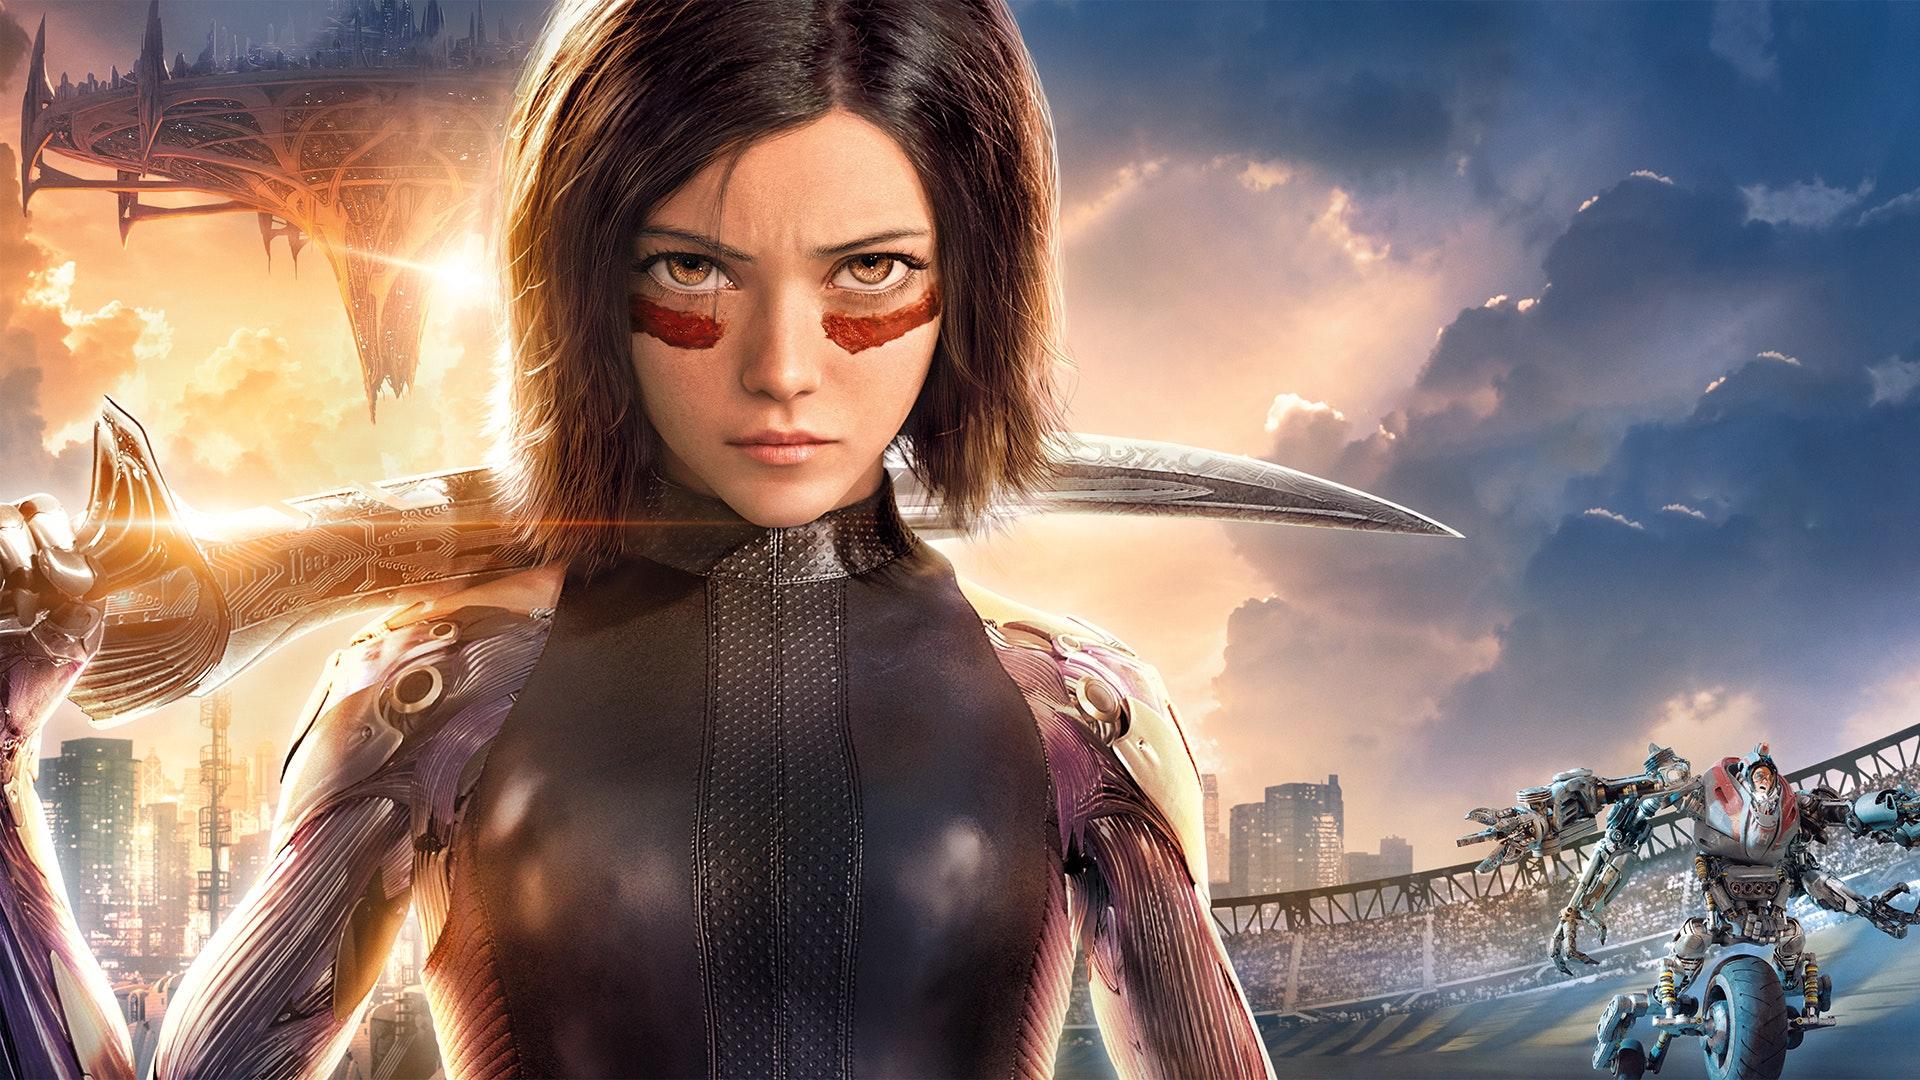 Watch Alita Battle Angel Online With Neon